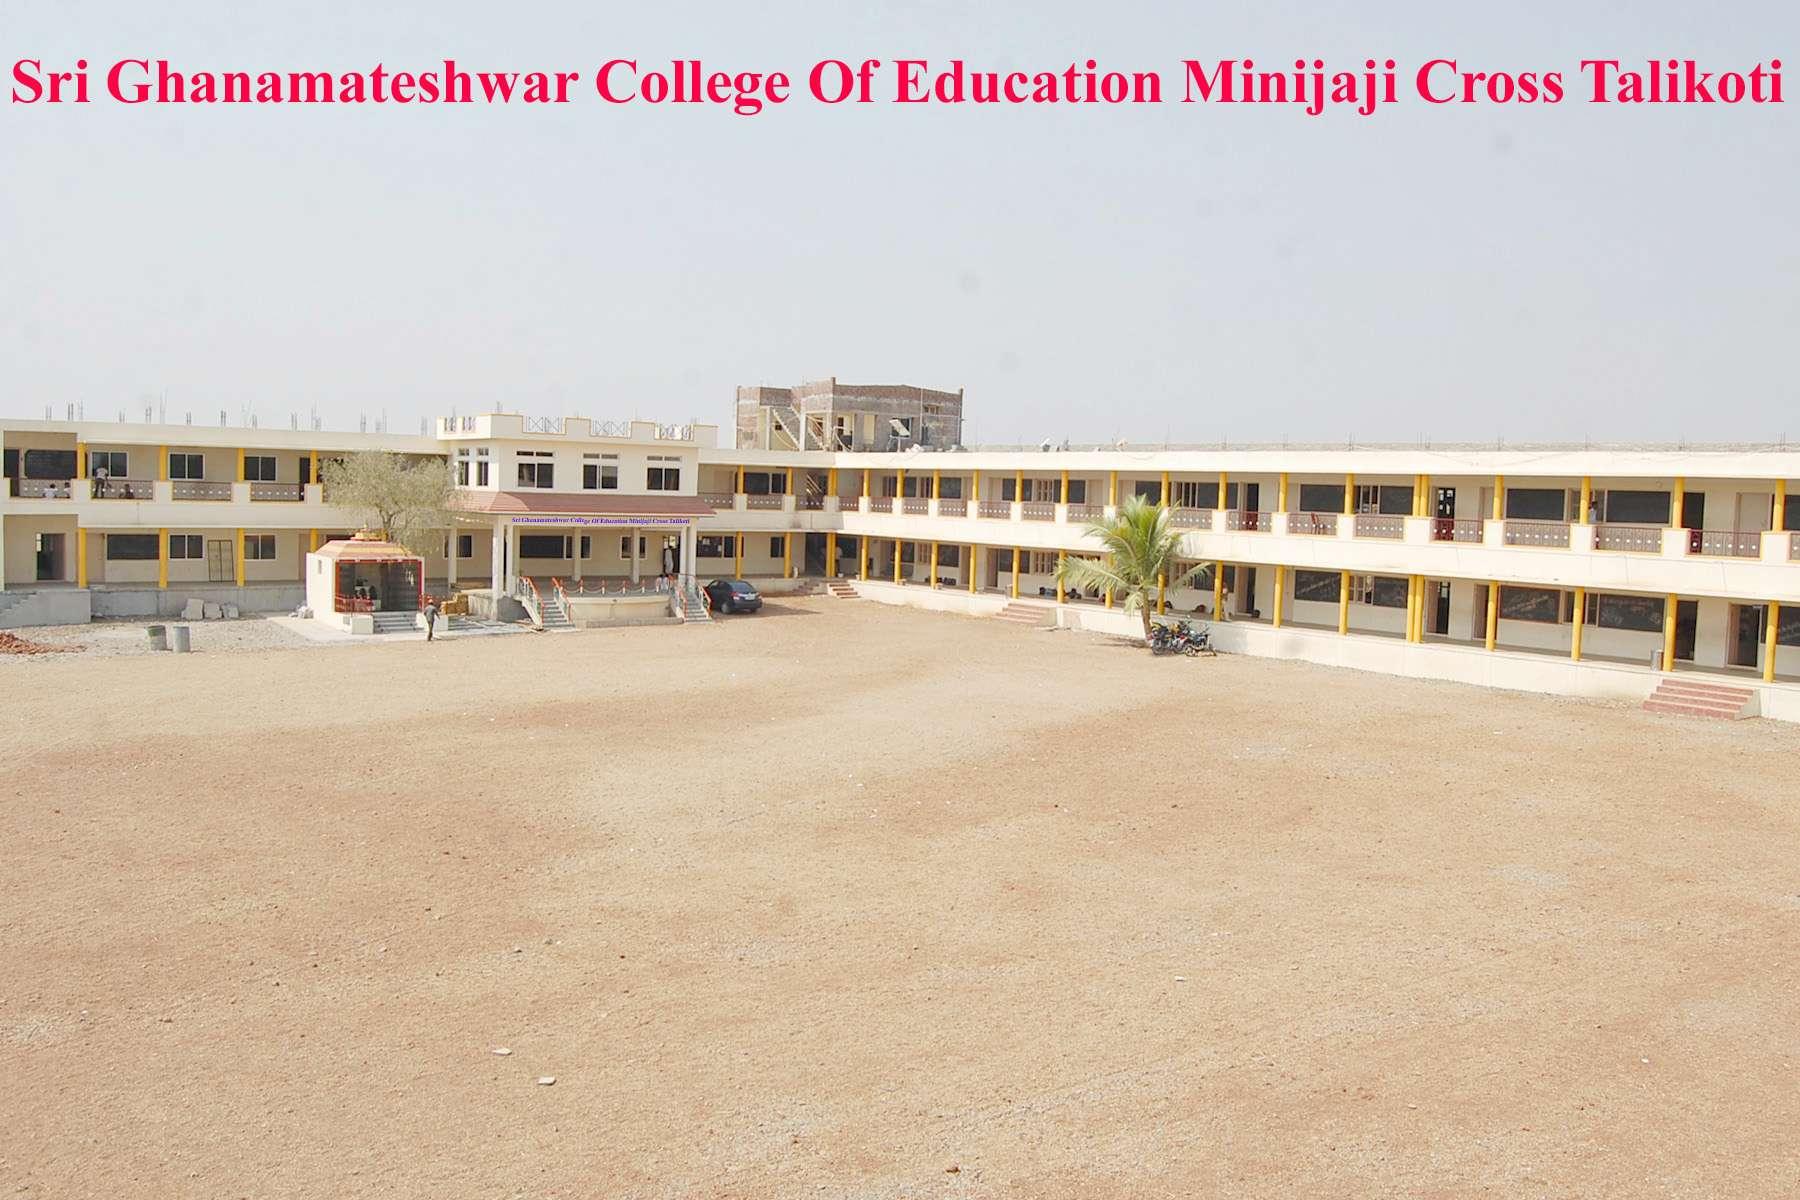 Shri Ghanamatheshwar International Public School Minajagi Cross Talikoti Tq Muddebihal 830381